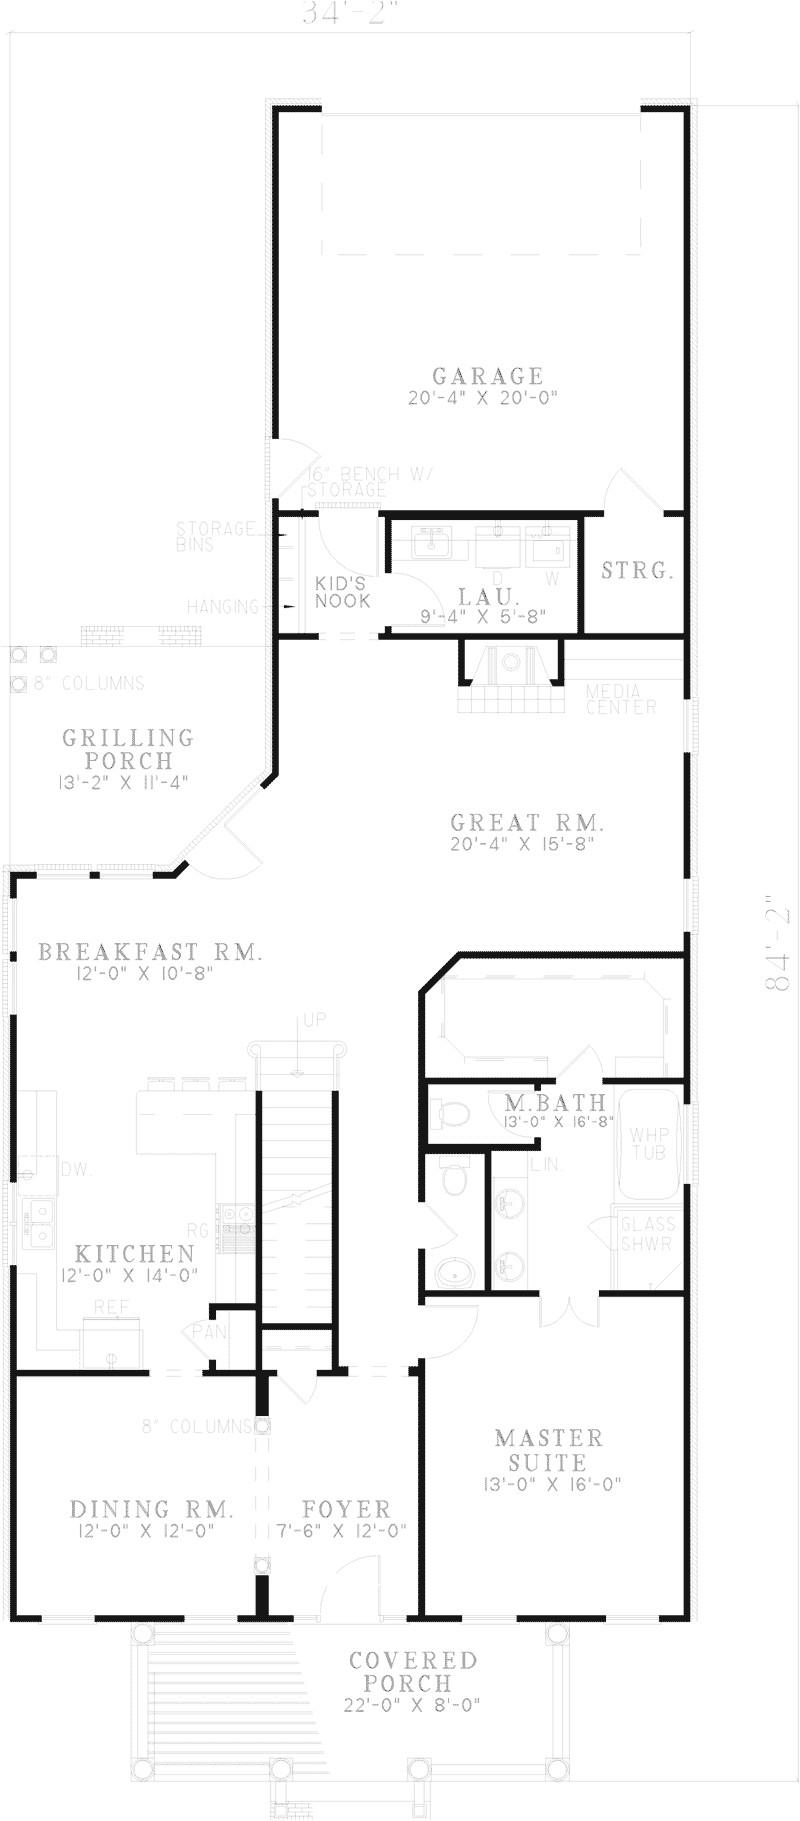 house plans narrow lot rear entry garage